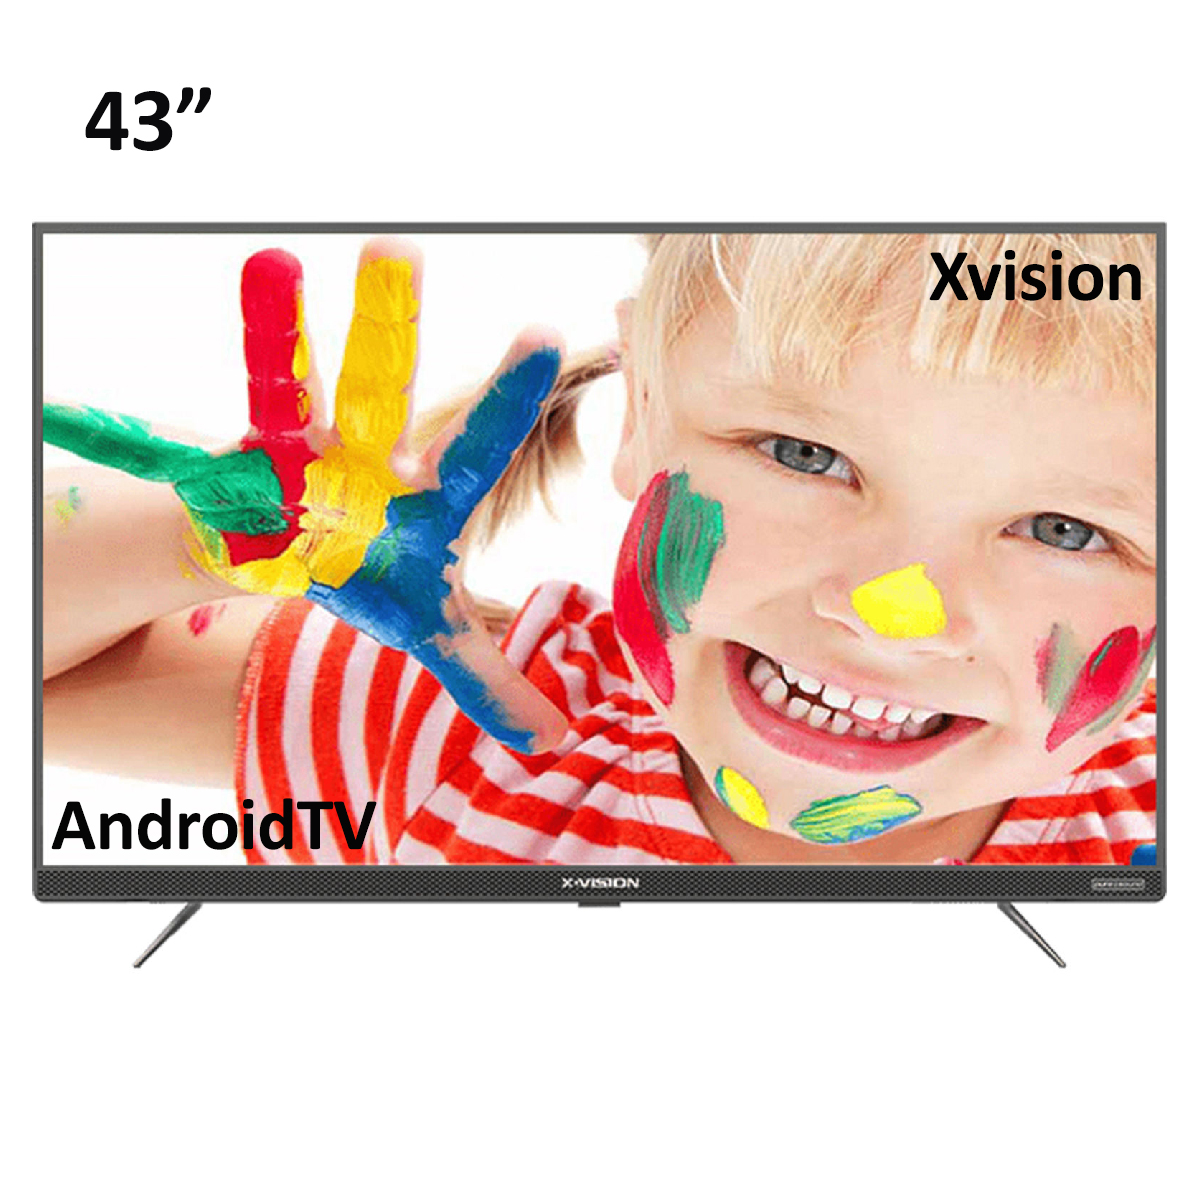 فروش نقدی و اقساطی تلویزیون ال ای دی هوشمند ایکس ویژن مدل 43XT745 سایز 43 اینچ